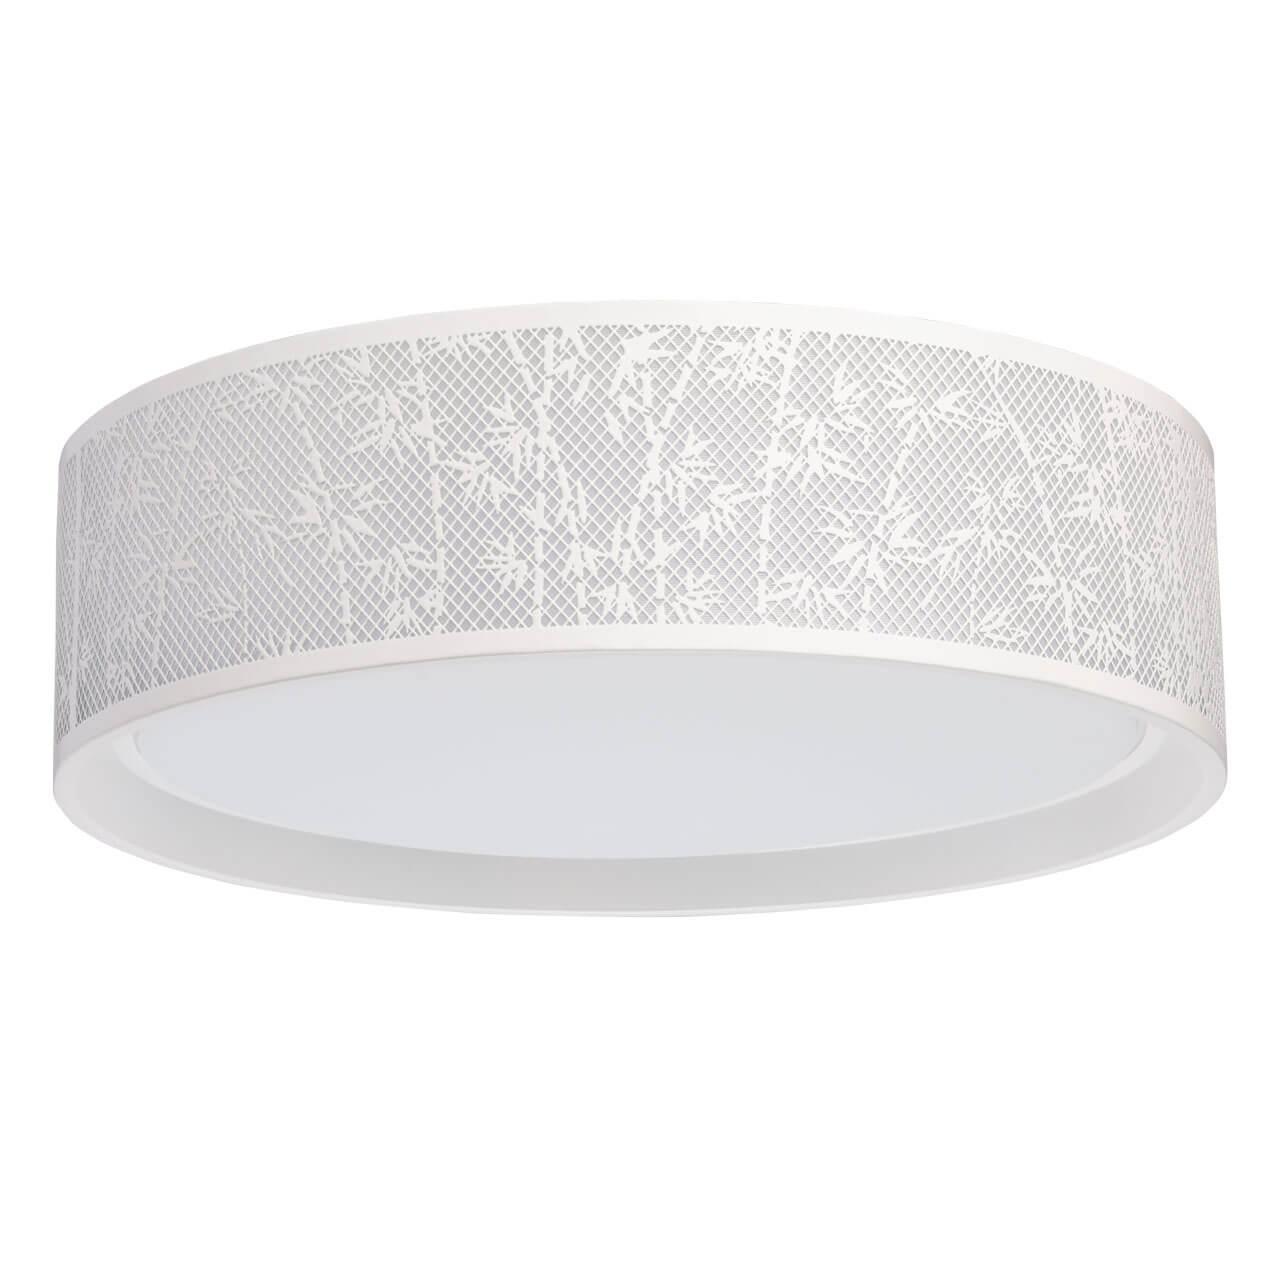 Накладной светильник MW-Light 674016101, LED, 50 Вт цена 2017